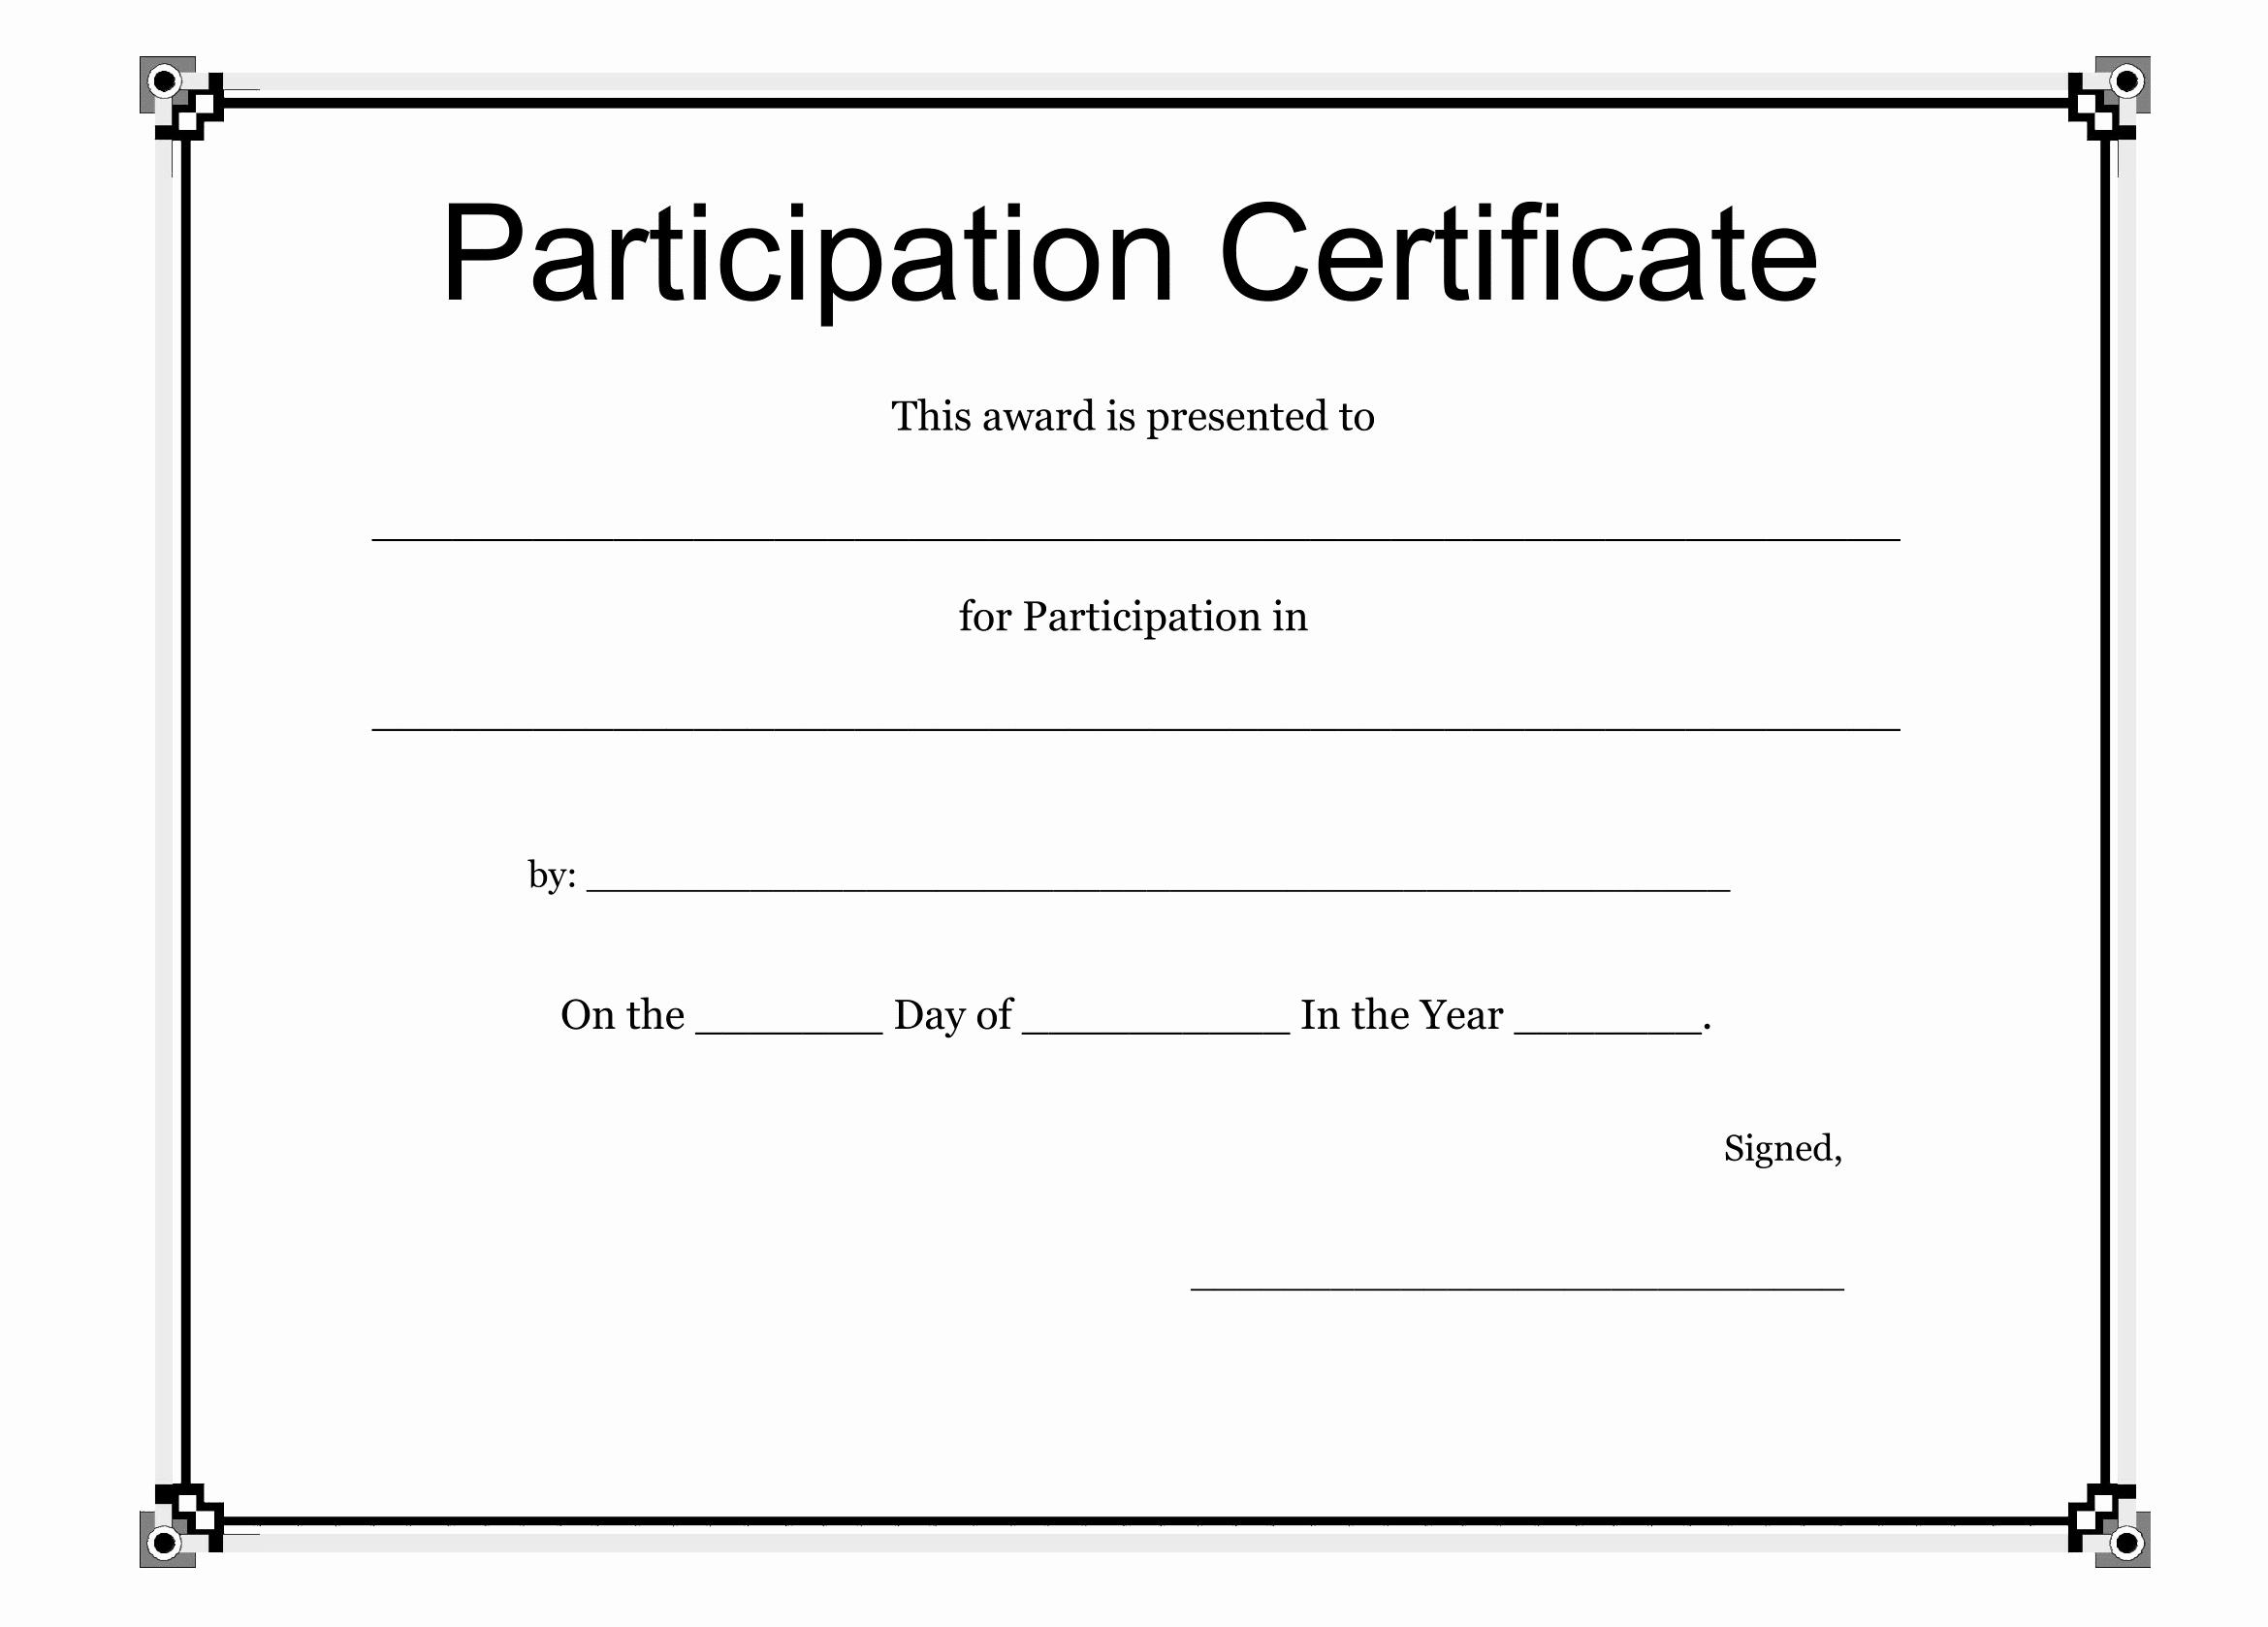 Certificate Design Templates Free Download Unique Participation Certificate Template Free Download